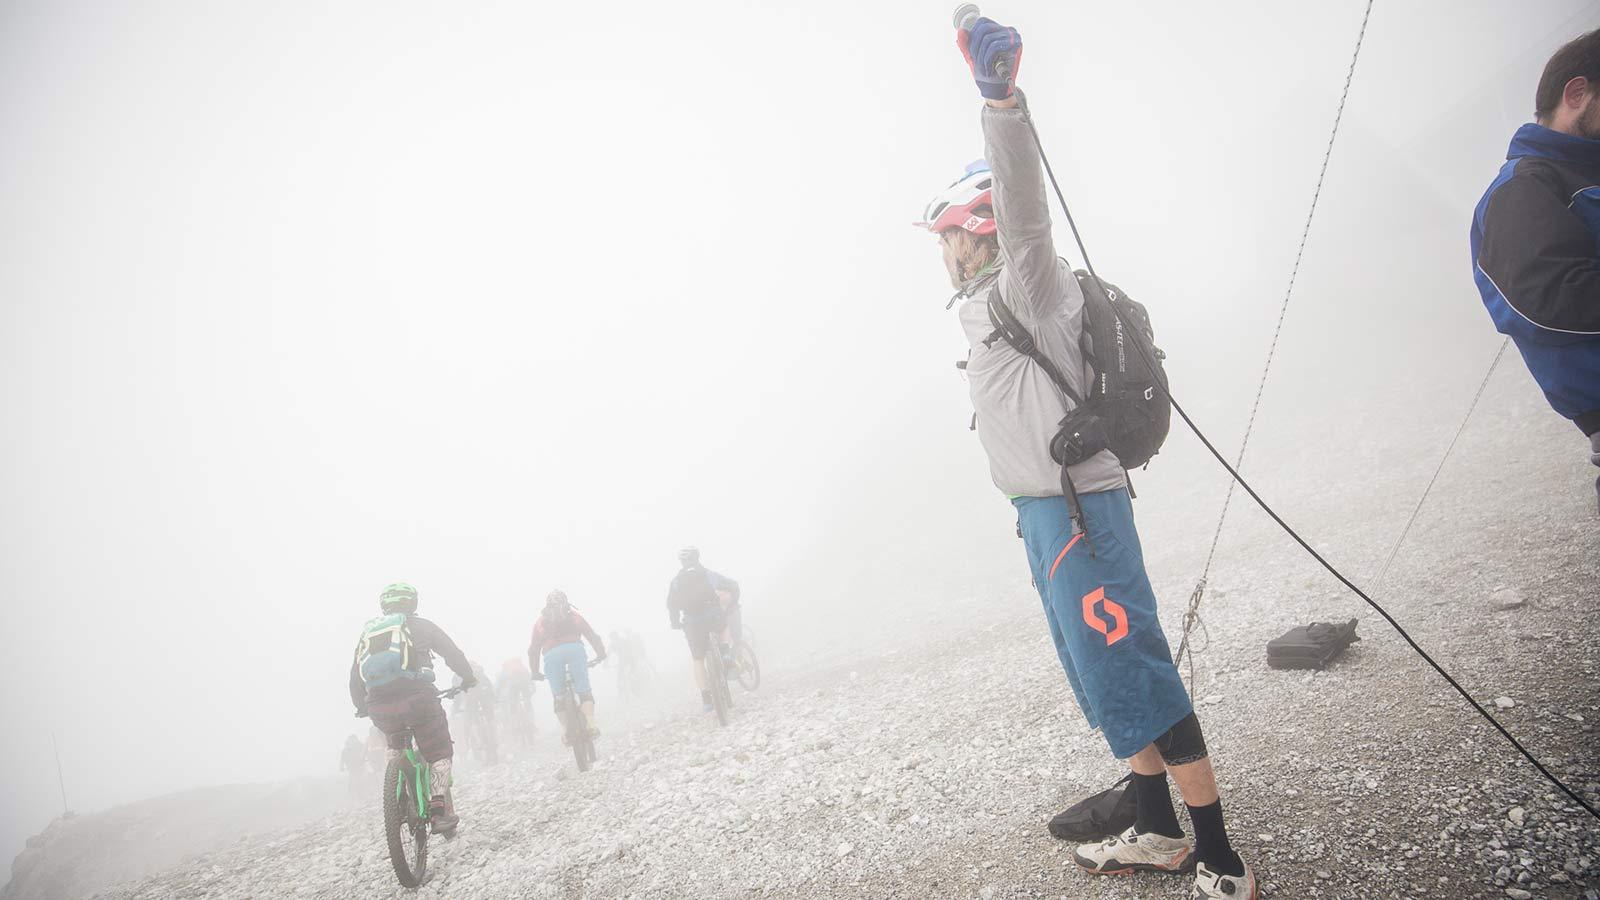 Event Hörnli Trailjagd 2017 - Start